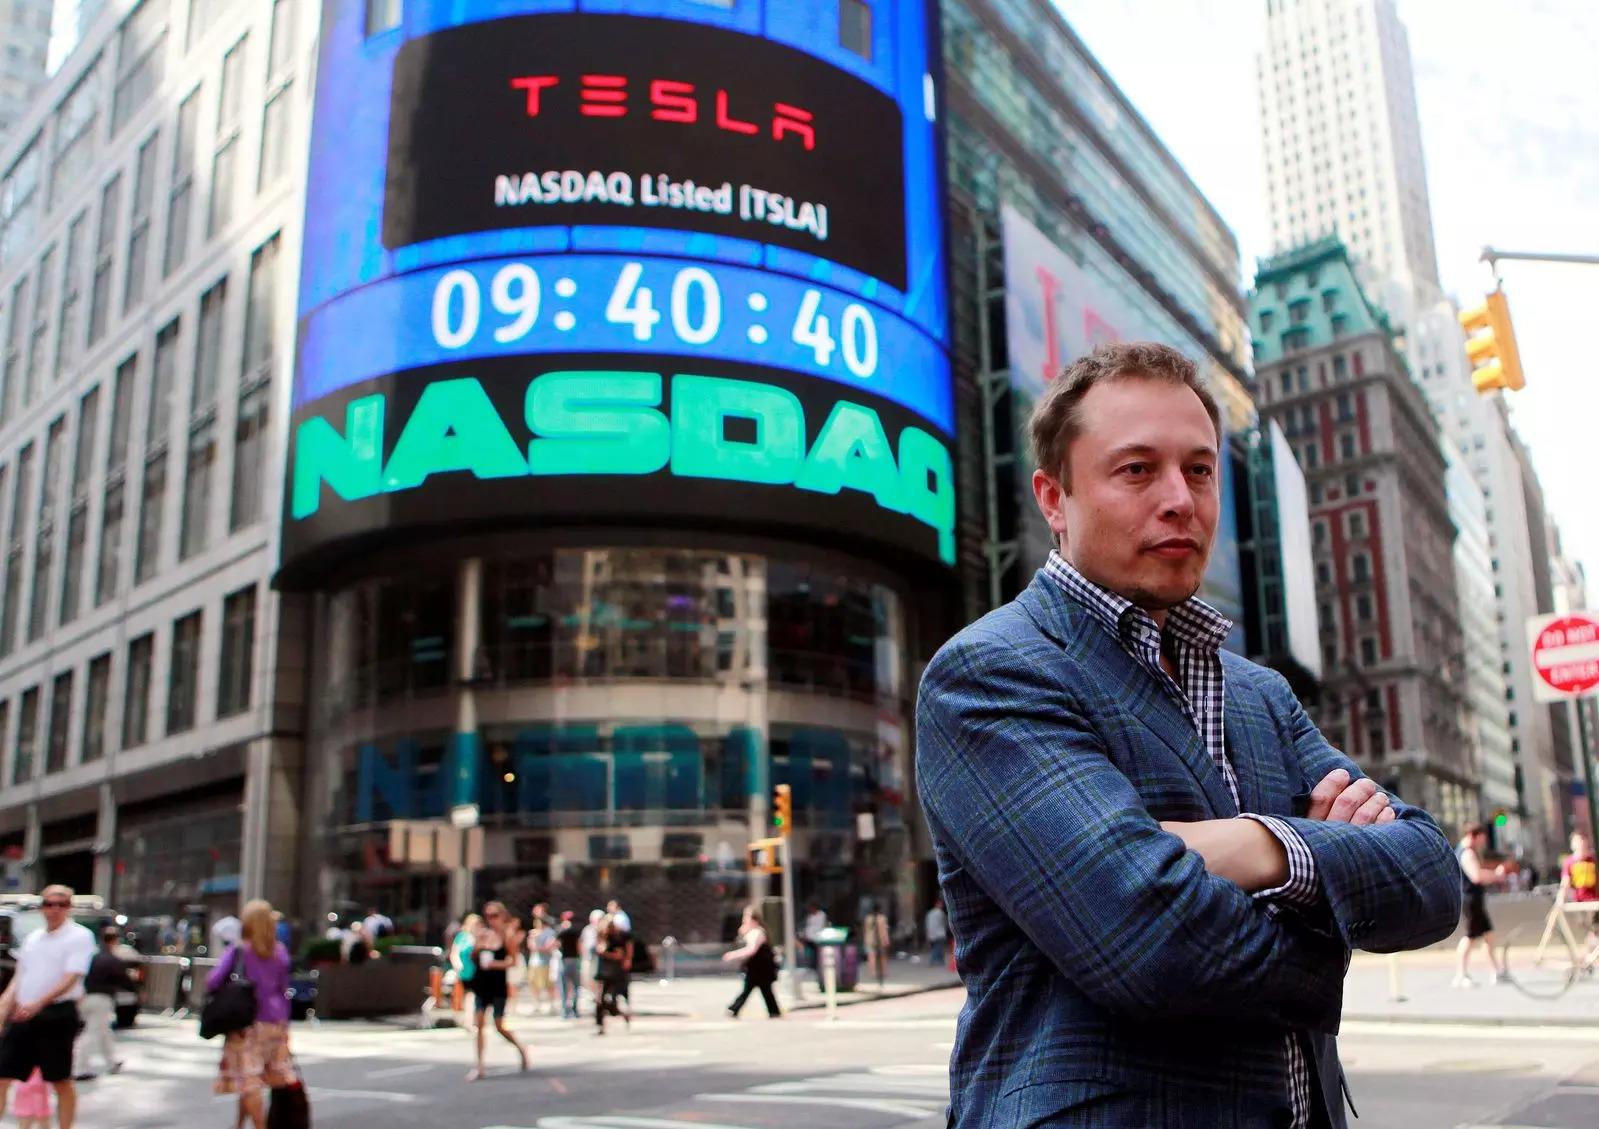 Elon Musk surpasses Jeff Bezos to become world's richest person